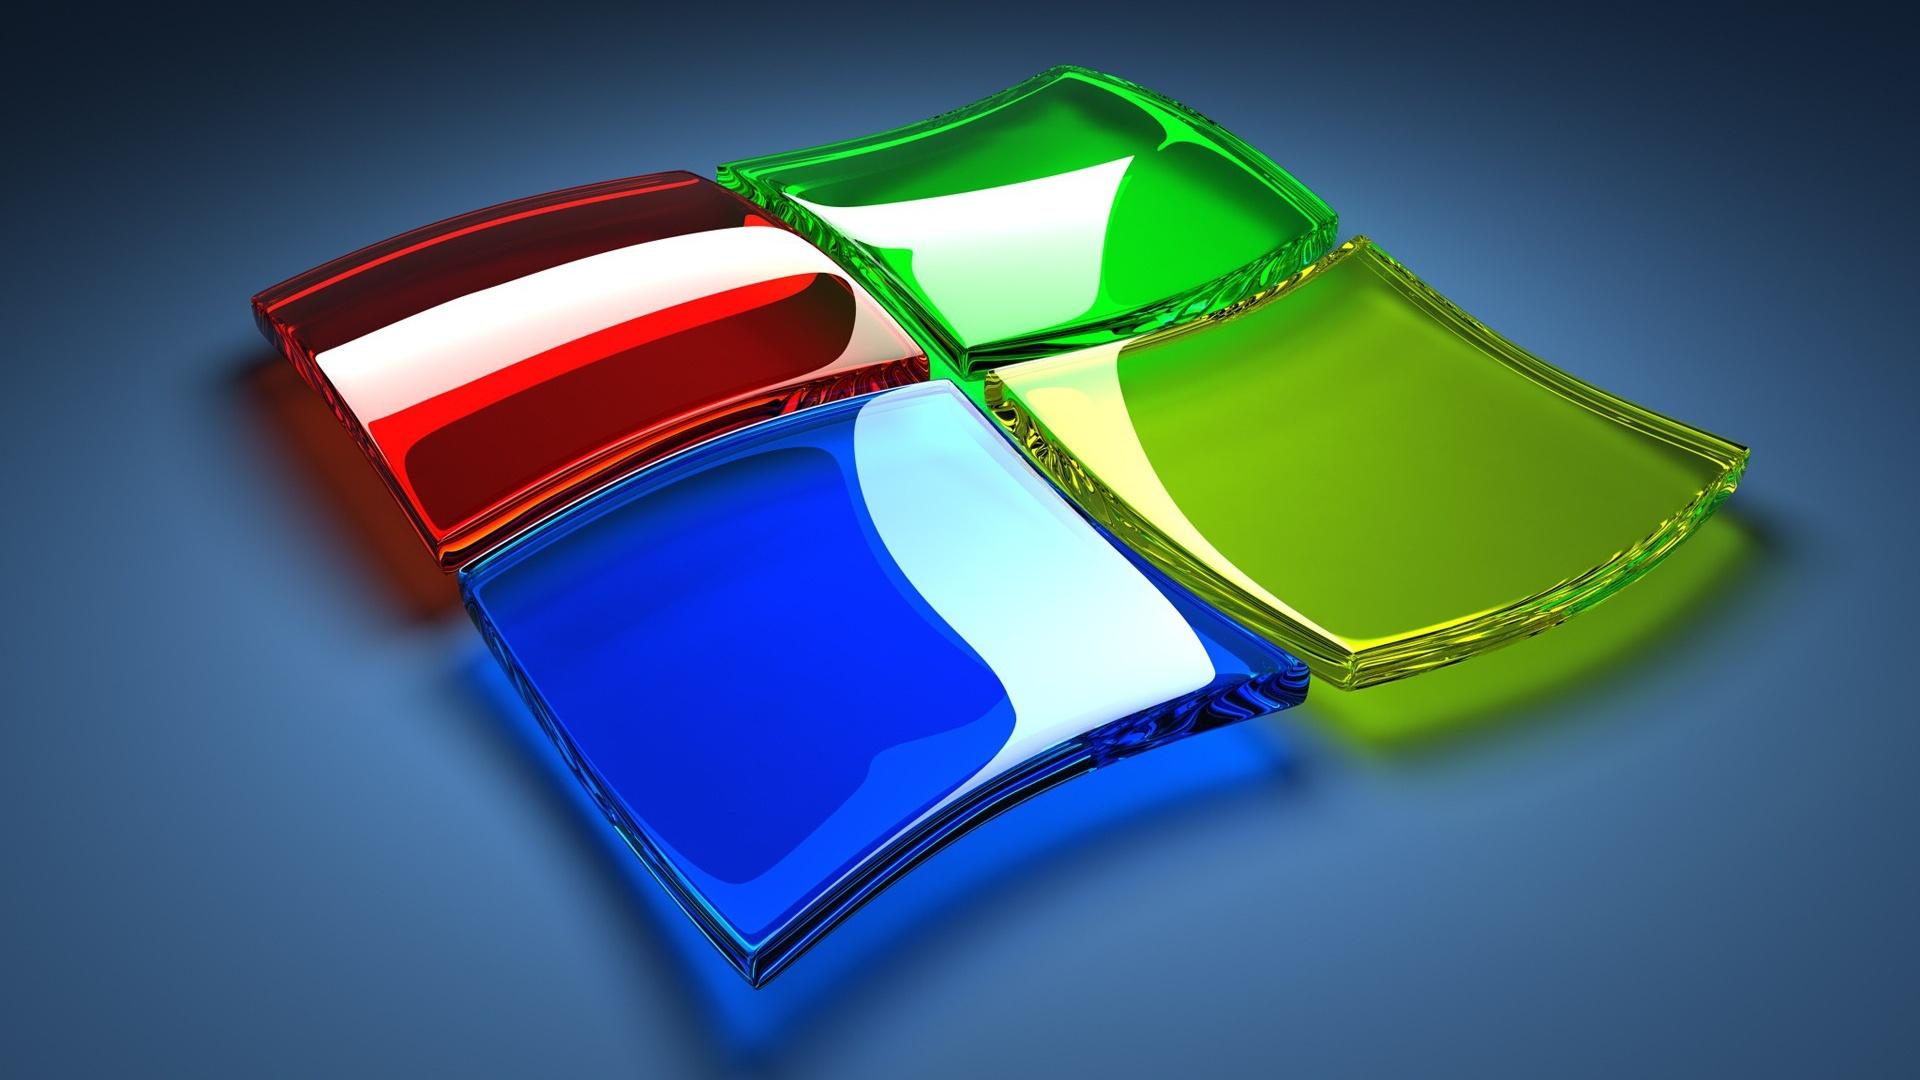 Best Windows 7 Wallpapers 1080p - WallpaperSafari